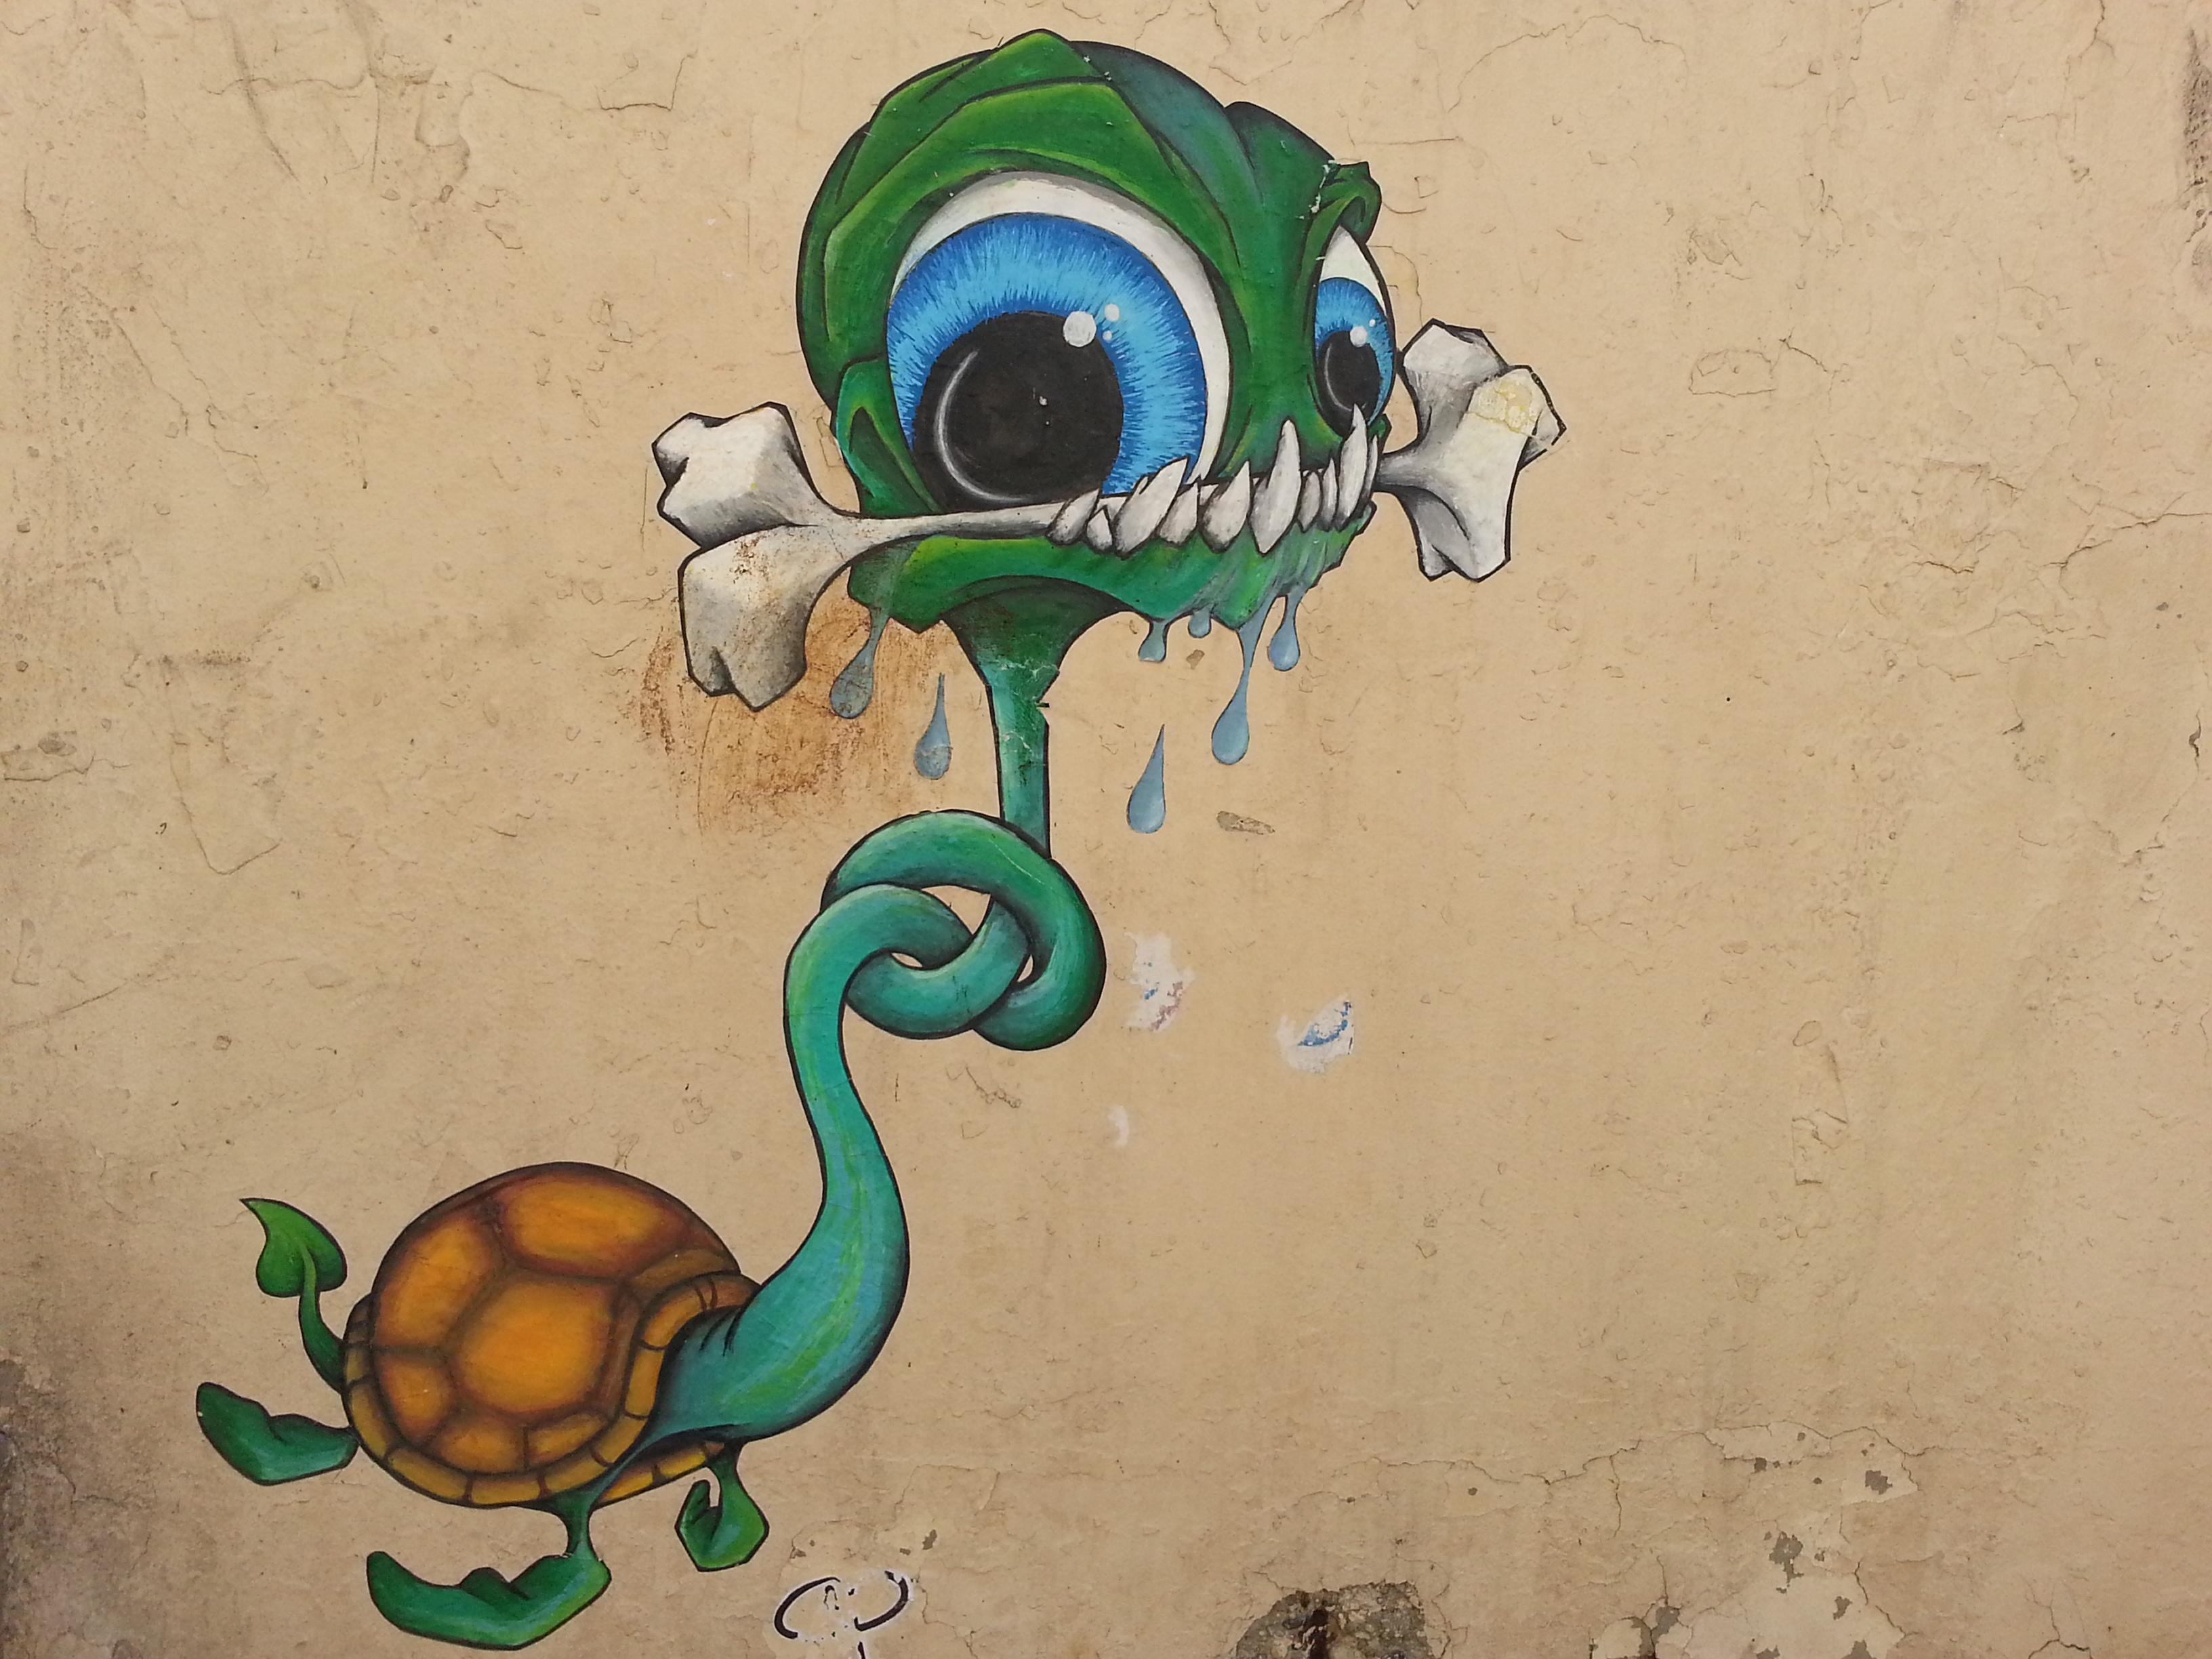 street art pentes croix rousse lyon 4